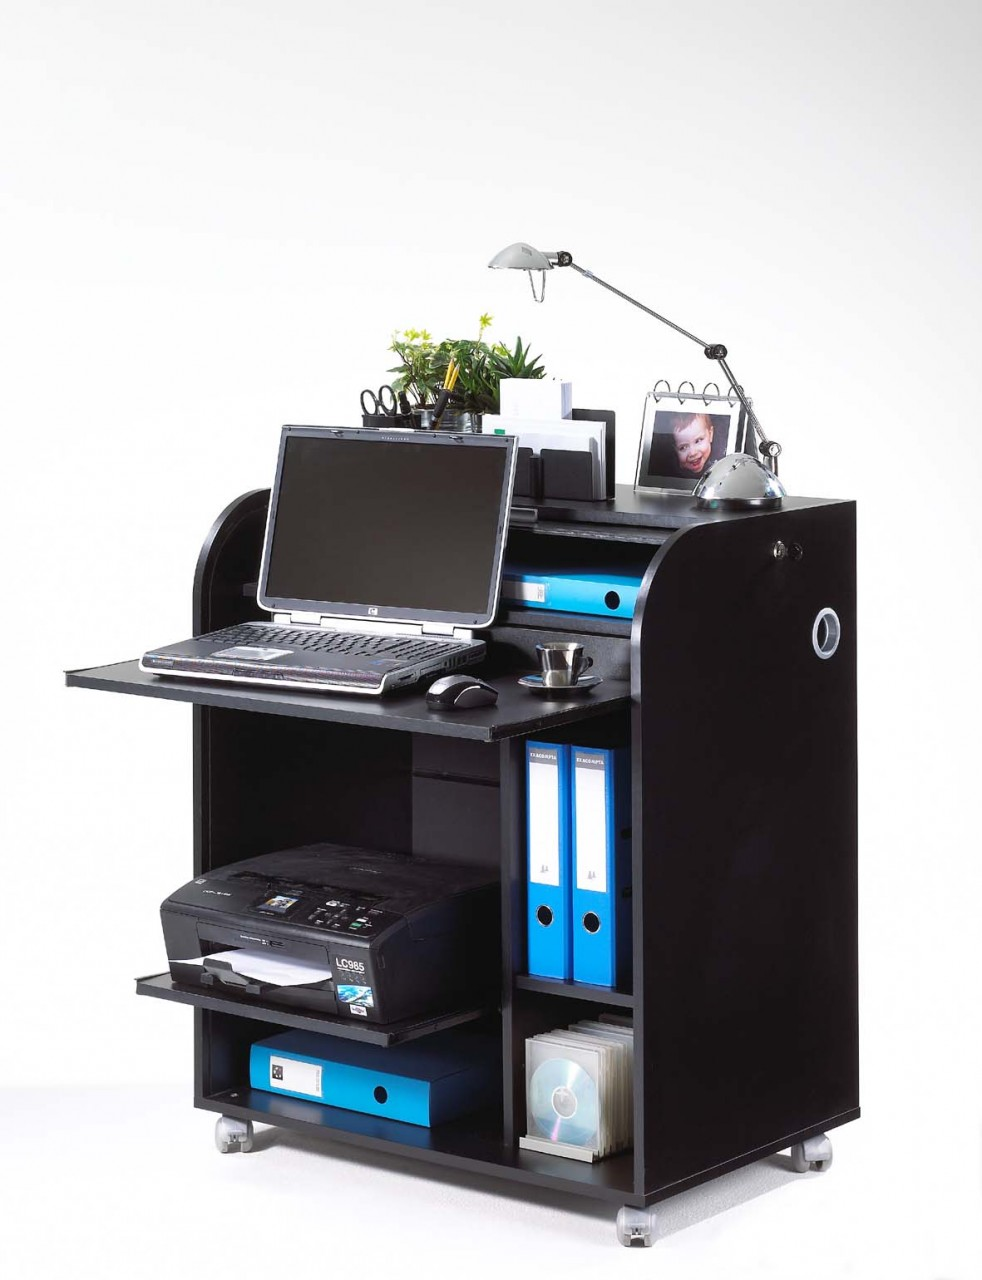 bureau nomade achat home offices 199 00. Black Bedroom Furniture Sets. Home Design Ideas